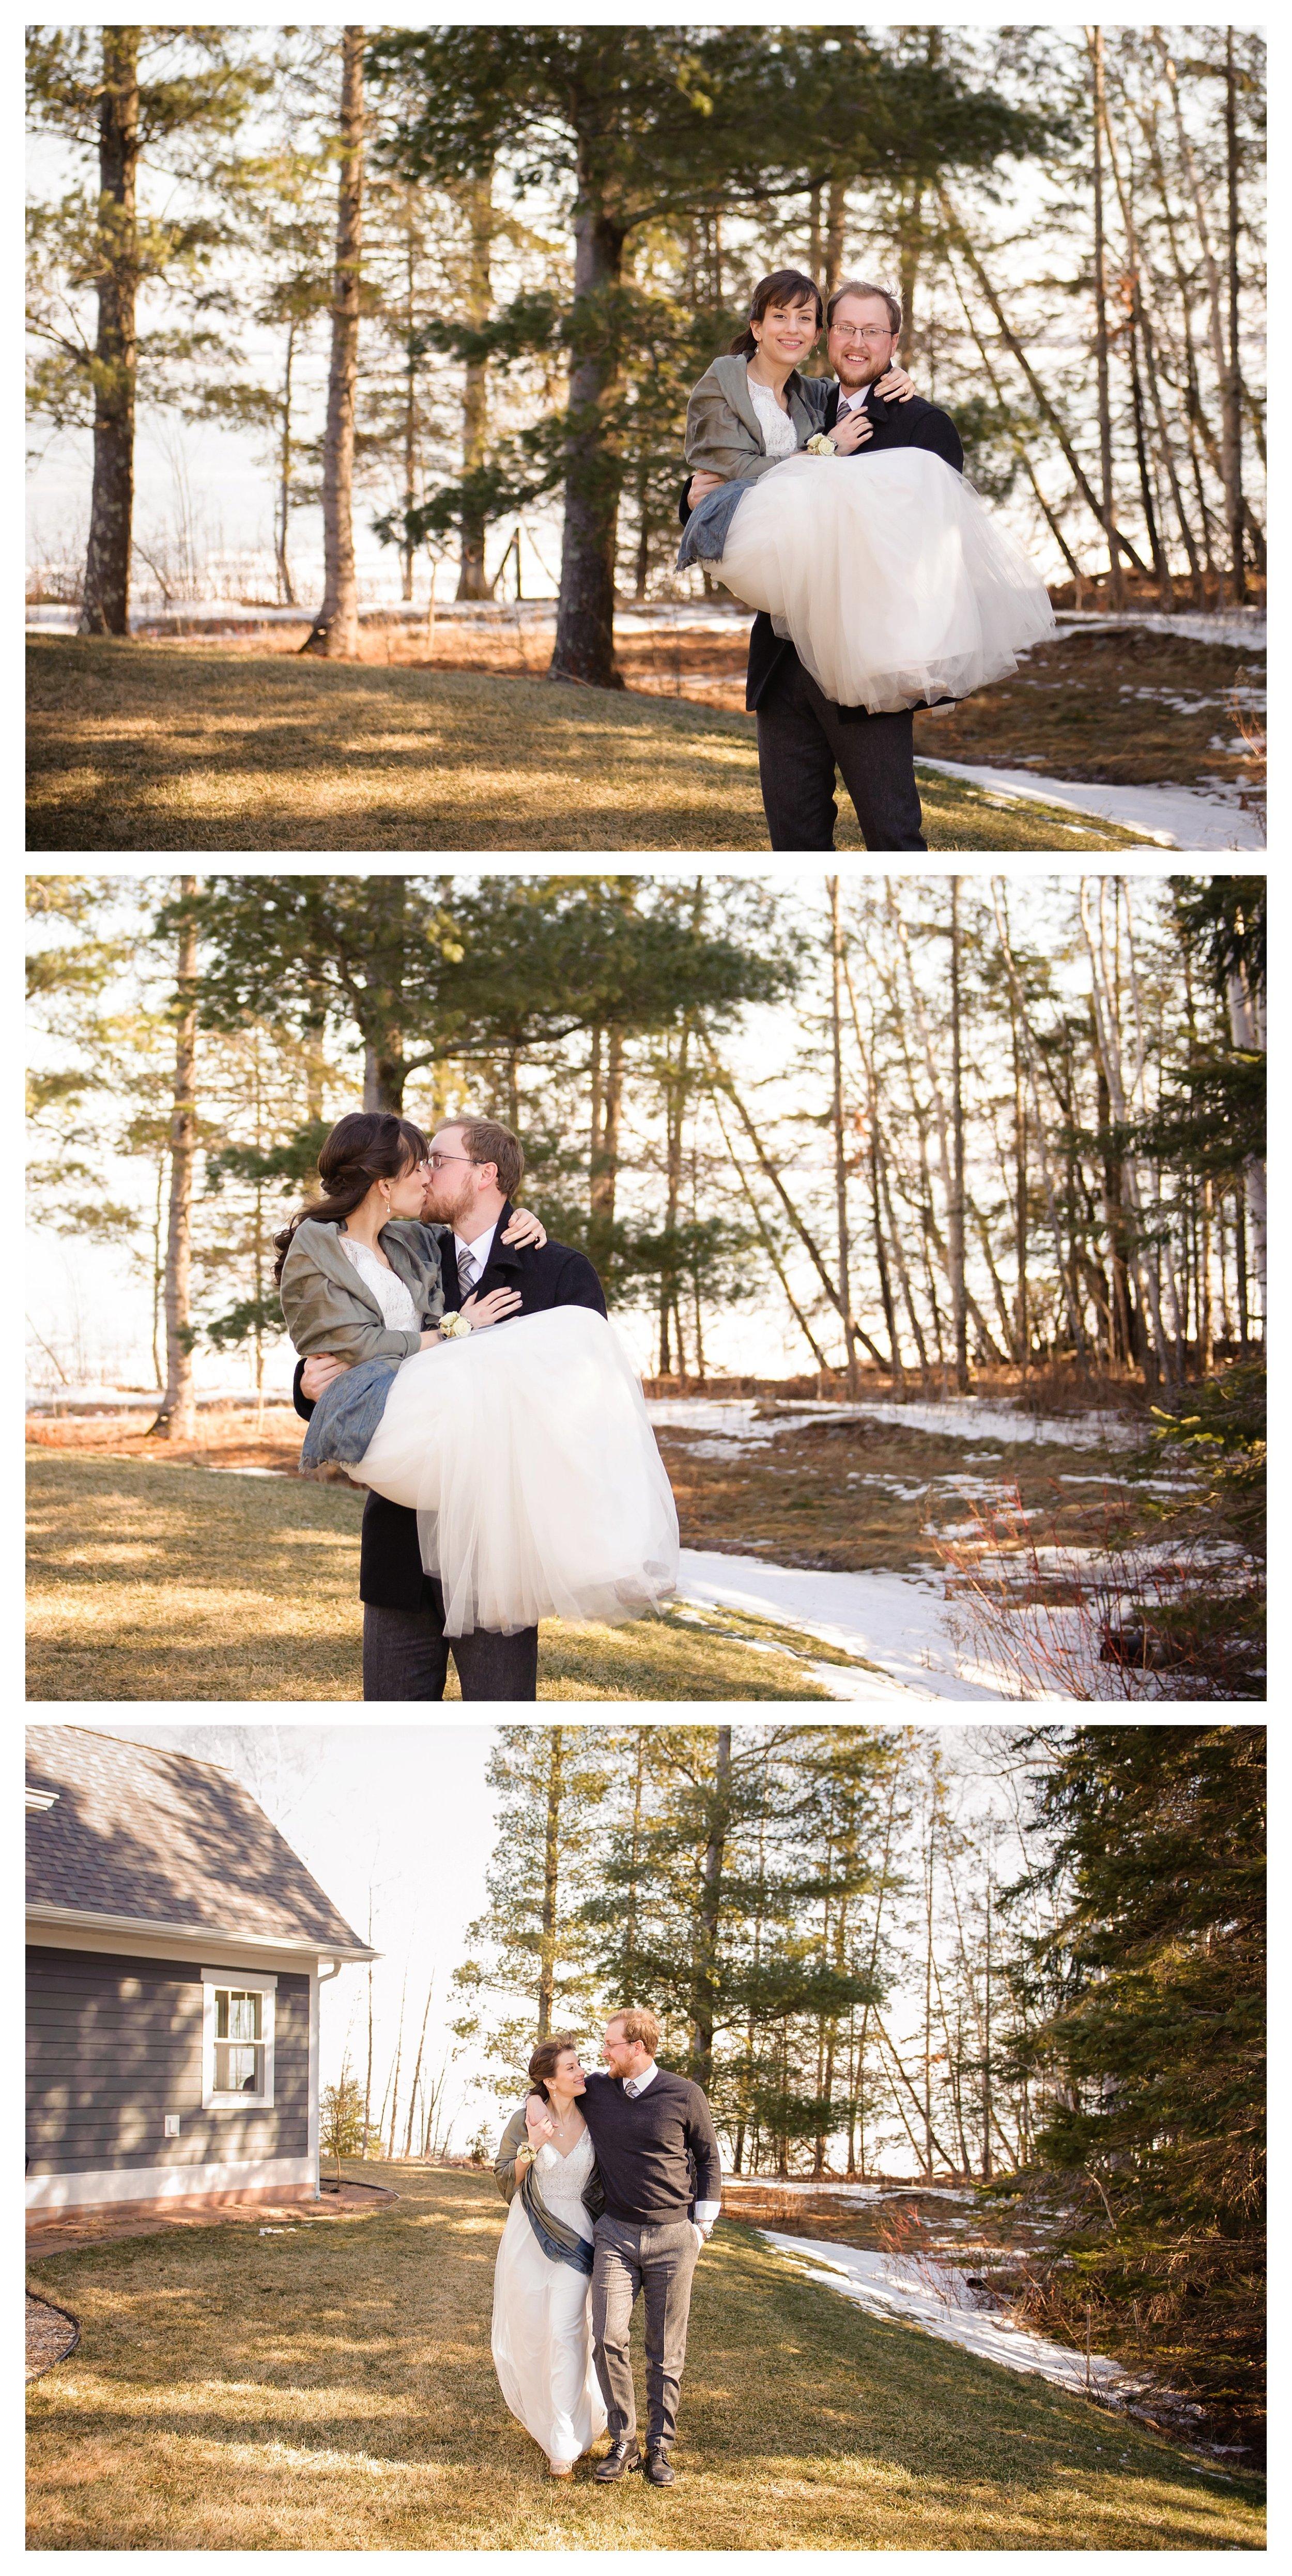 wisconsin wedding photographer timber baron inn bayfield wi ps 139 photography jen jensen_0218.jpg